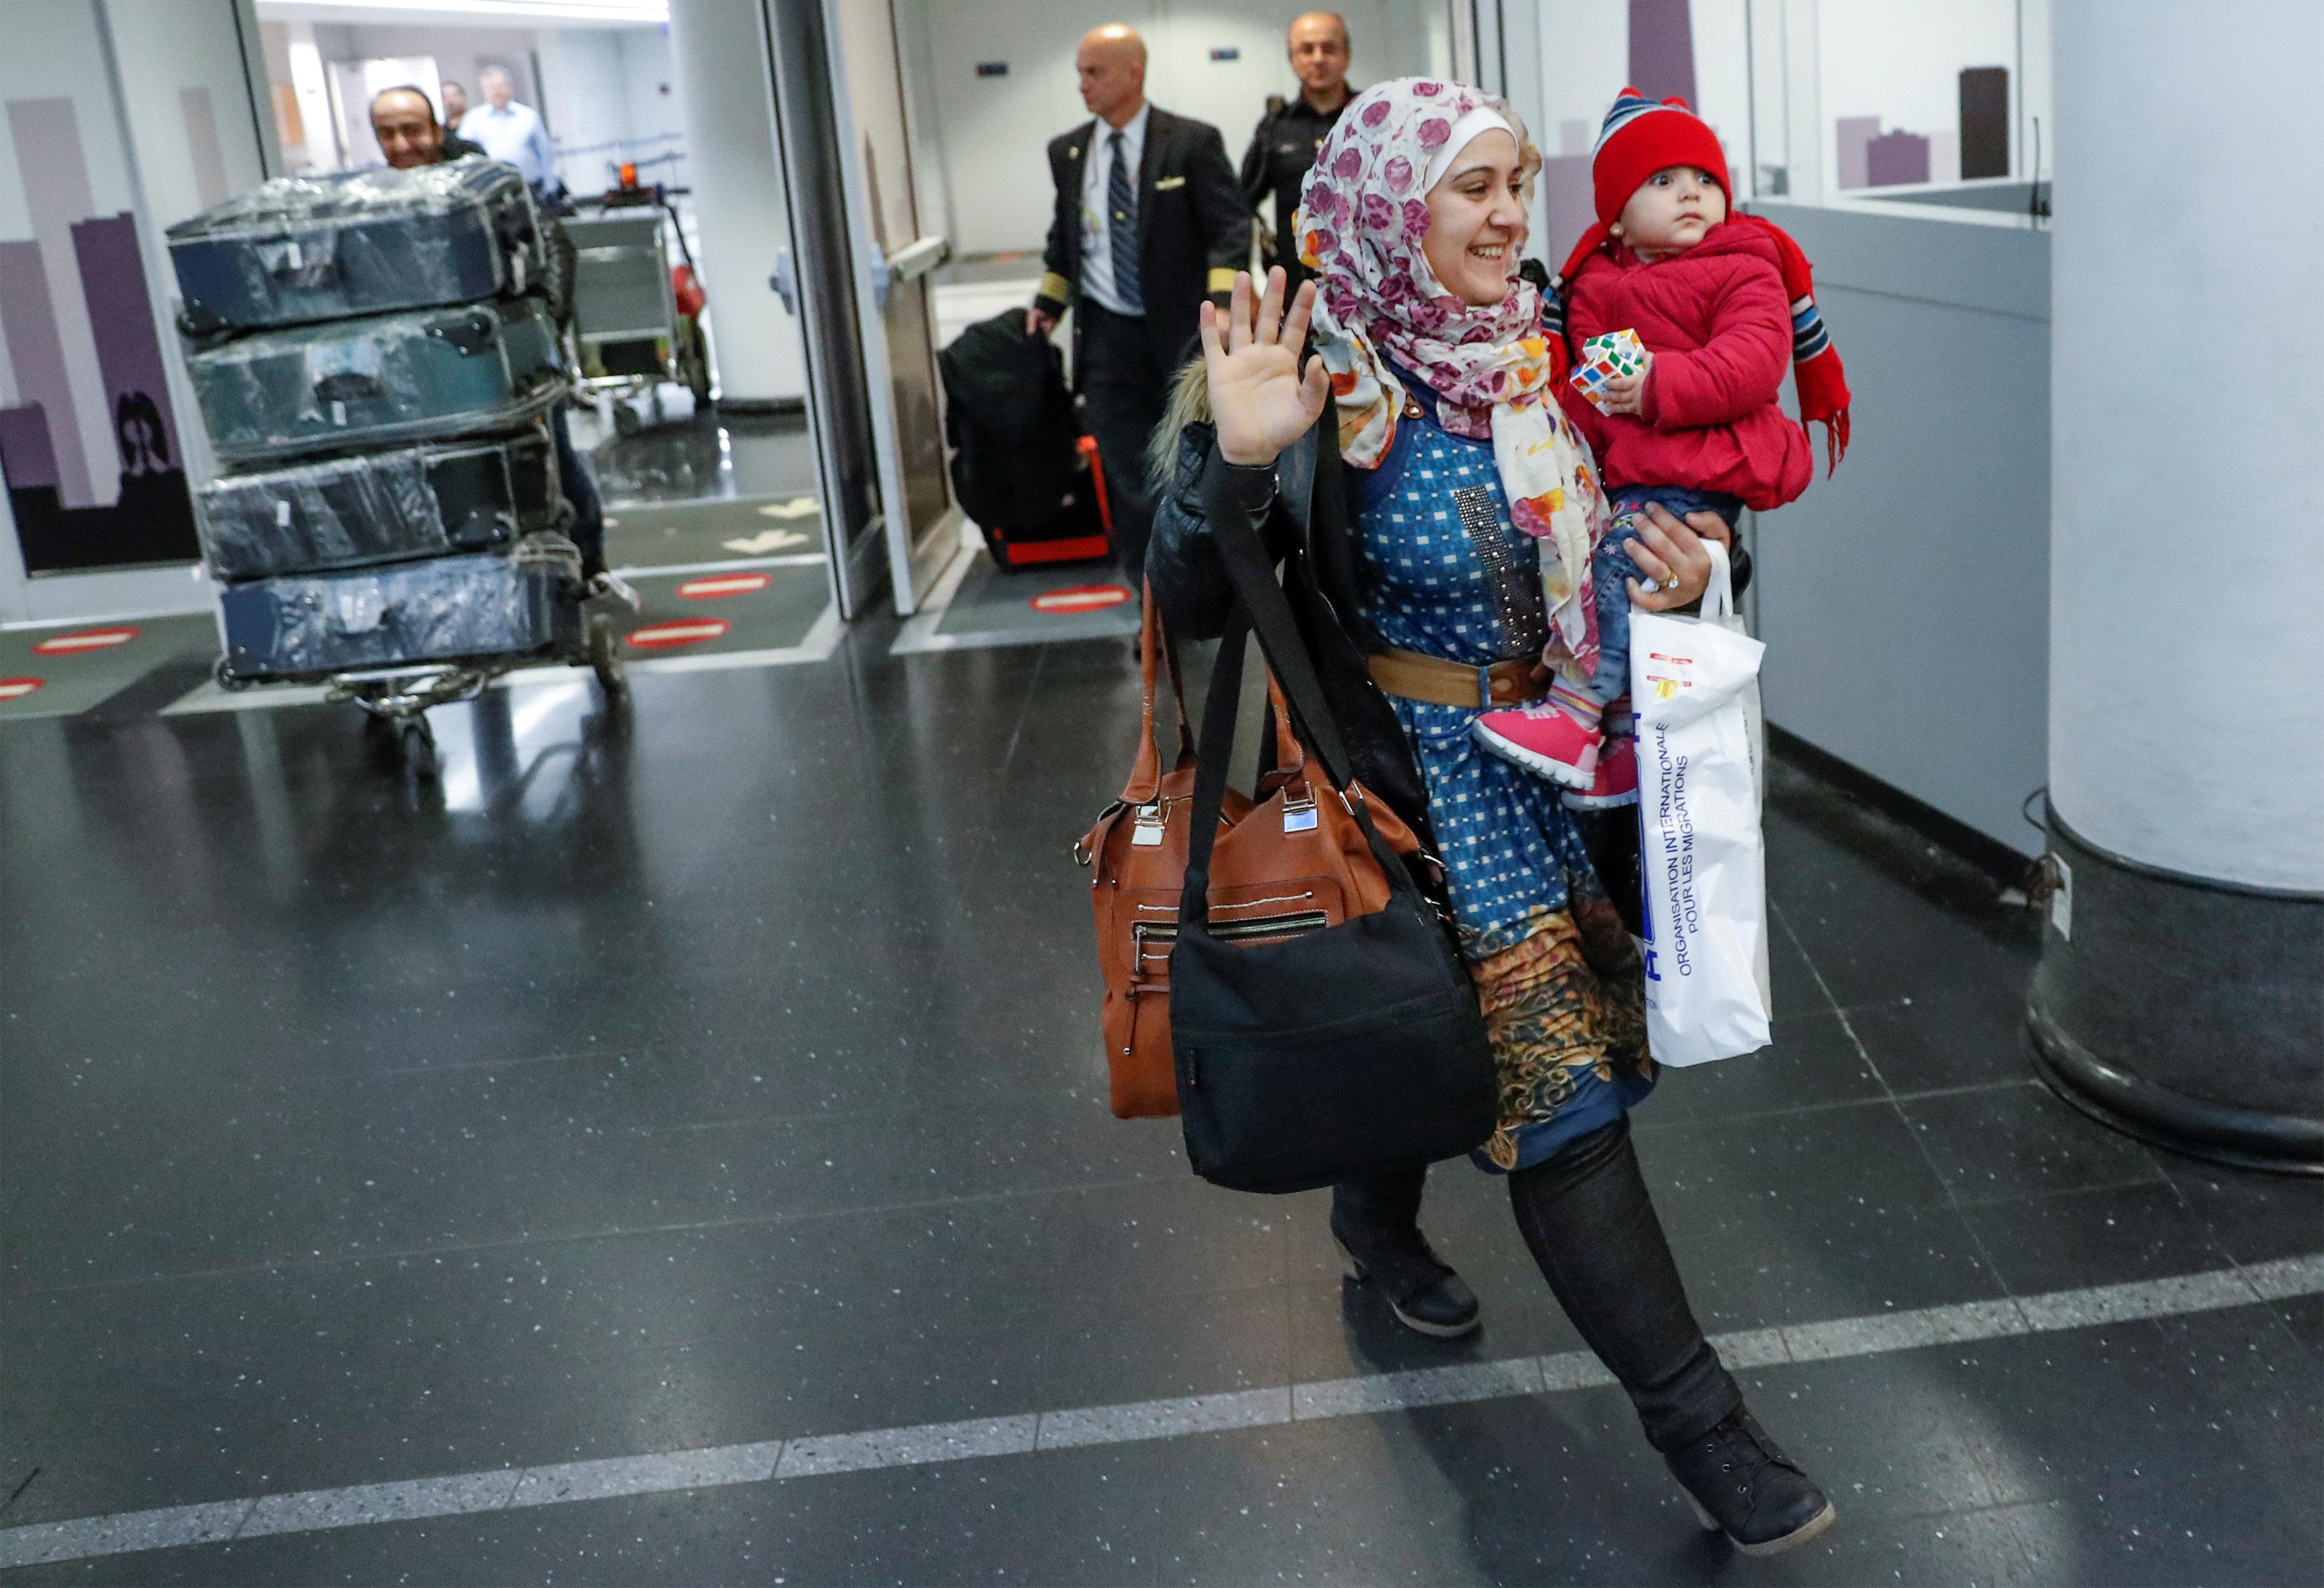 Syrian refugee Baraa Haj Khalaf, her daughter Shams, 1, and husband Abdulmajeed arrive at O'Hare International Airport in Chicago, Illinois, U.S. February 7, 2017.  REUTERS/Kamil Krzaczynski